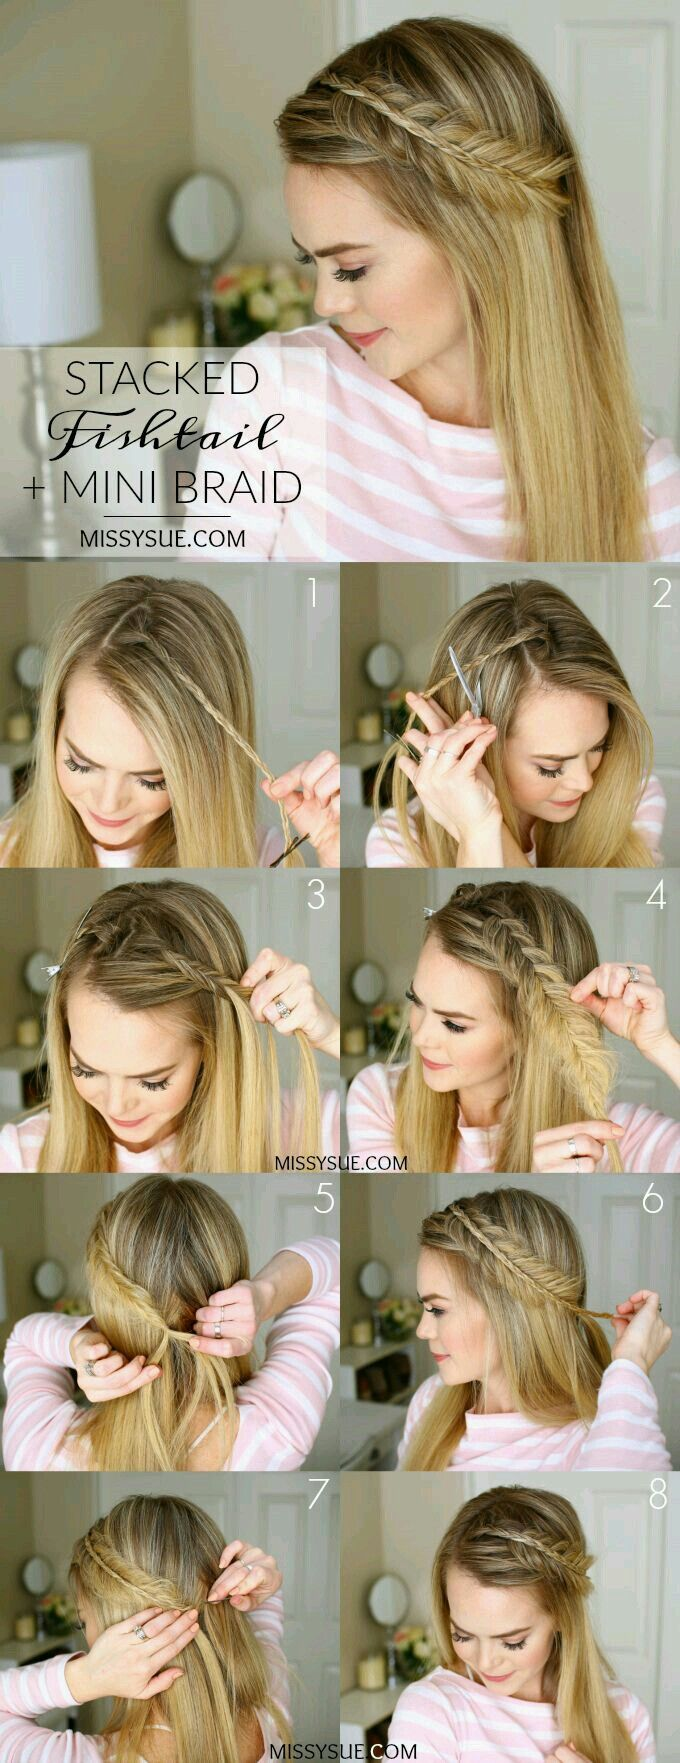 Pin by miureumi mitre on peinados pinterest hair style makeup